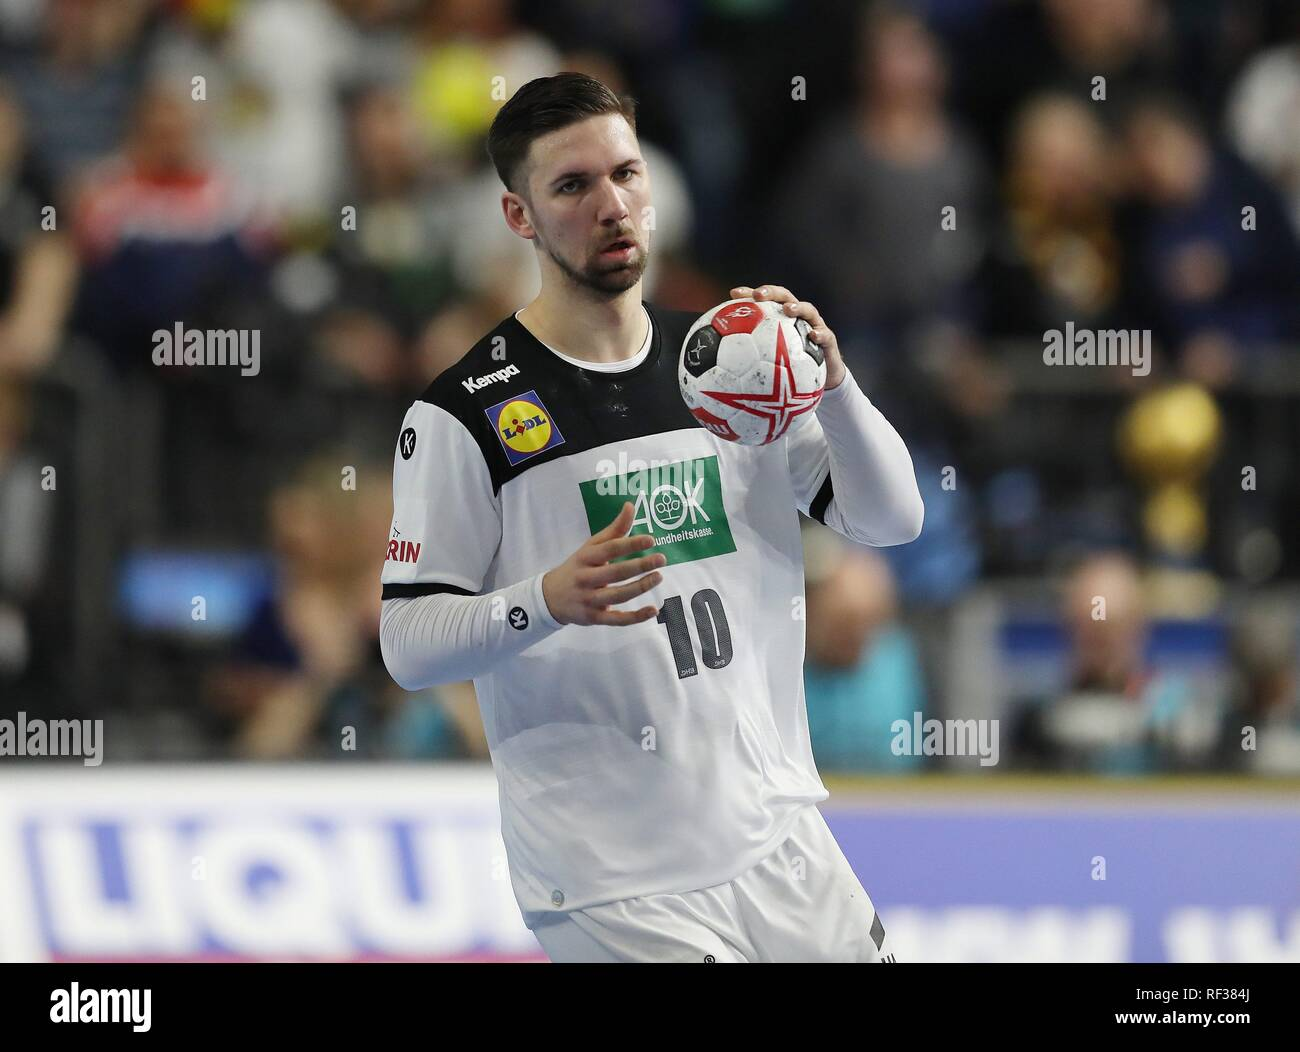 firo: 23.01.2019, Handball: World Cup World Cup Main Round Germany - Spain 31:30 single action, Fabian, Wiede, GER   usage worldwide - Stock Image